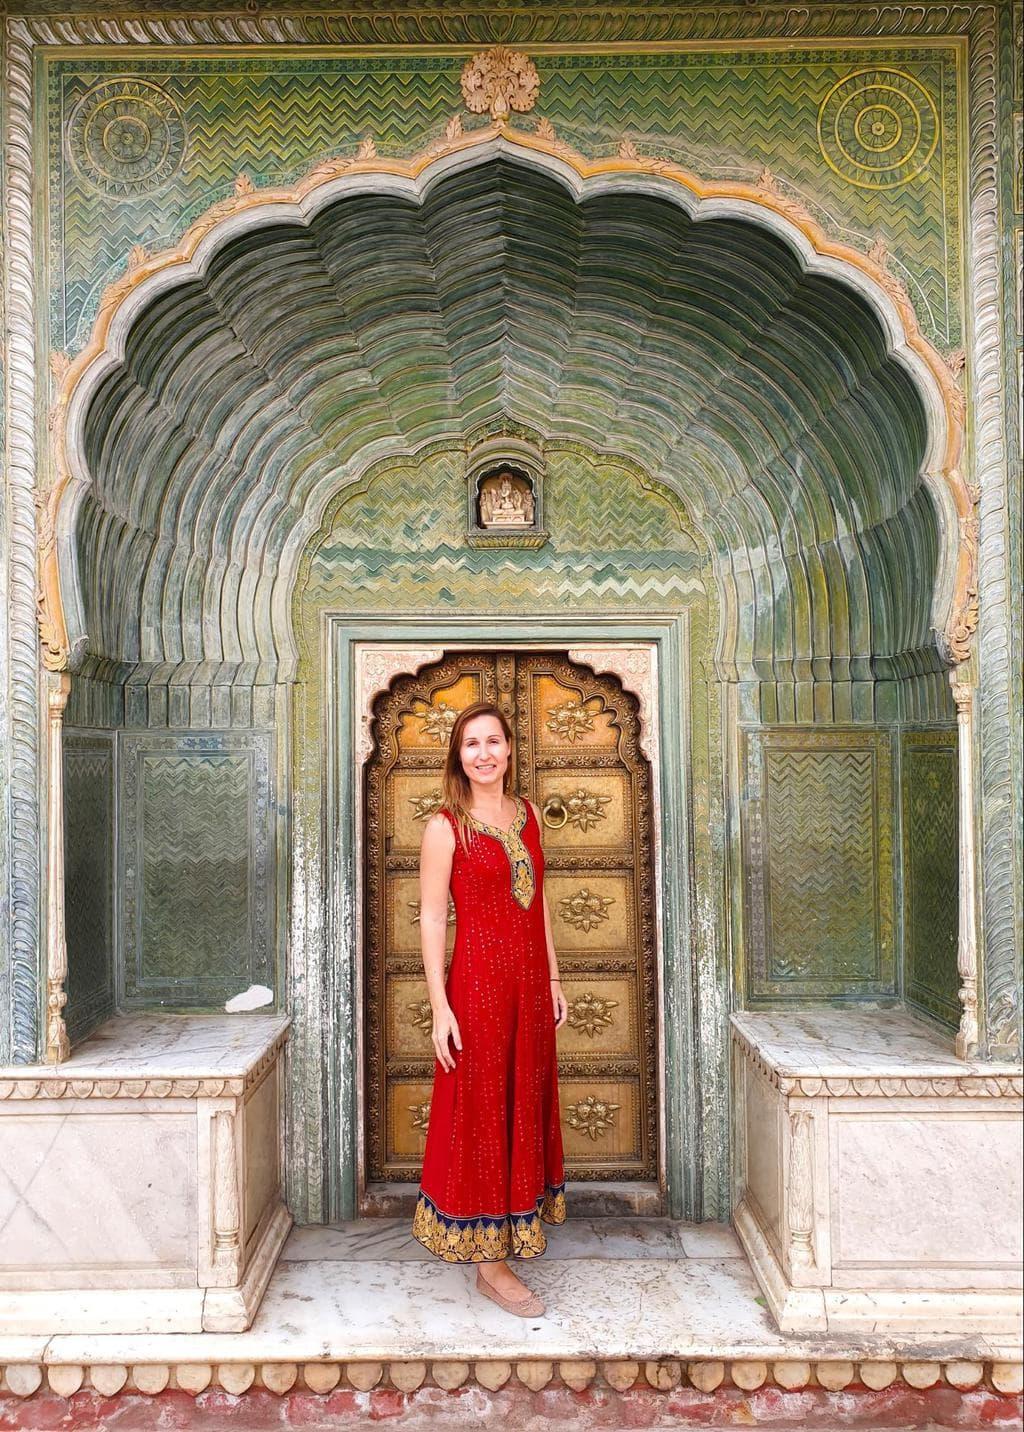 The beautiful gates at Jaipur's City palace 01